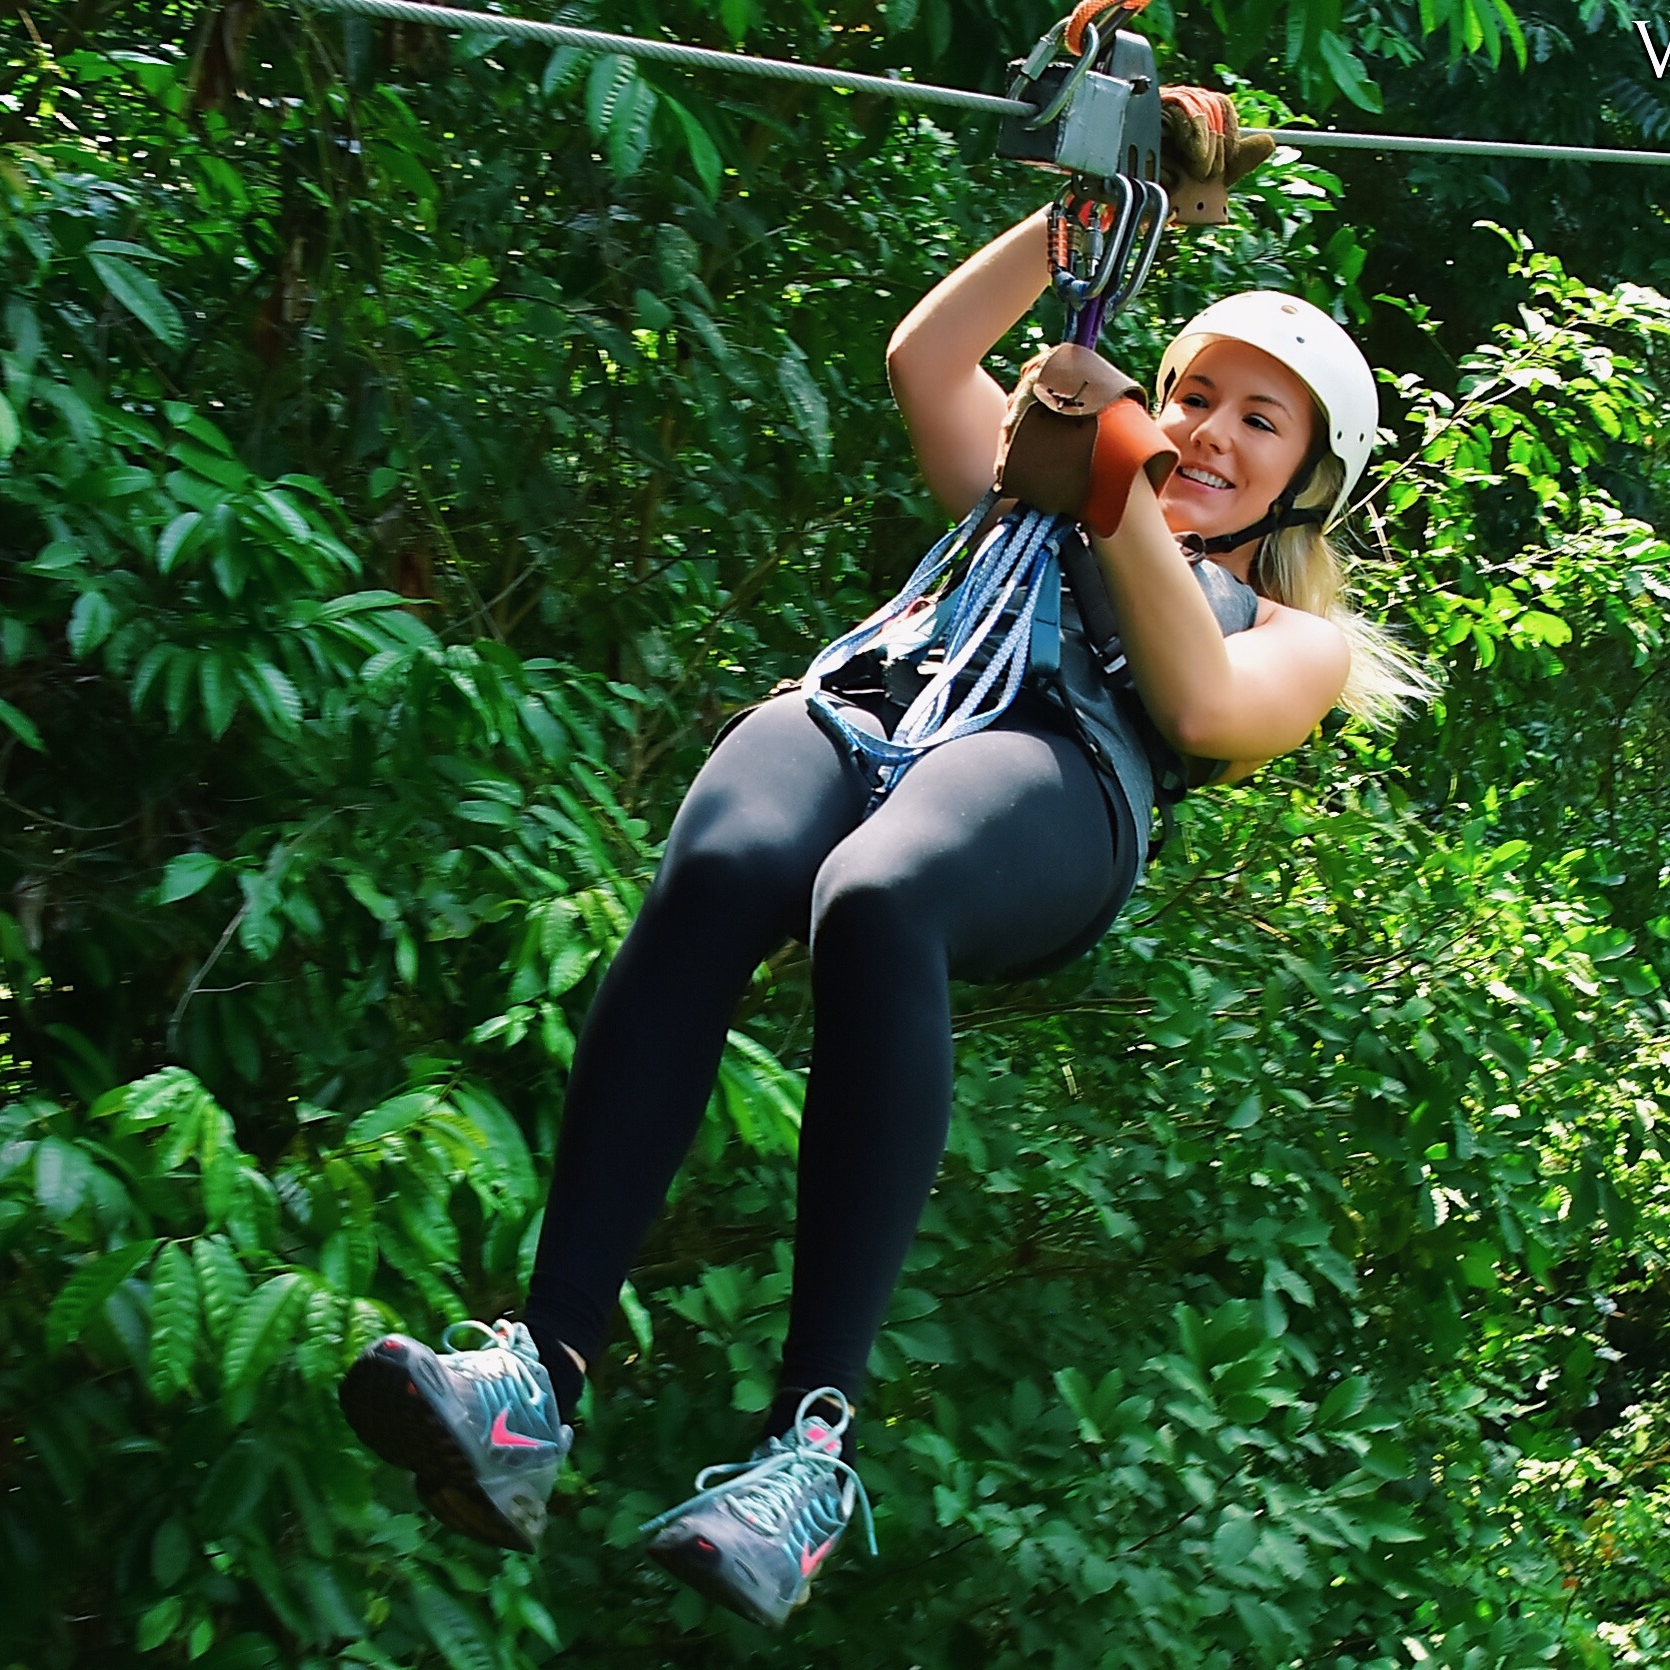 Zip-lining through the rainforest